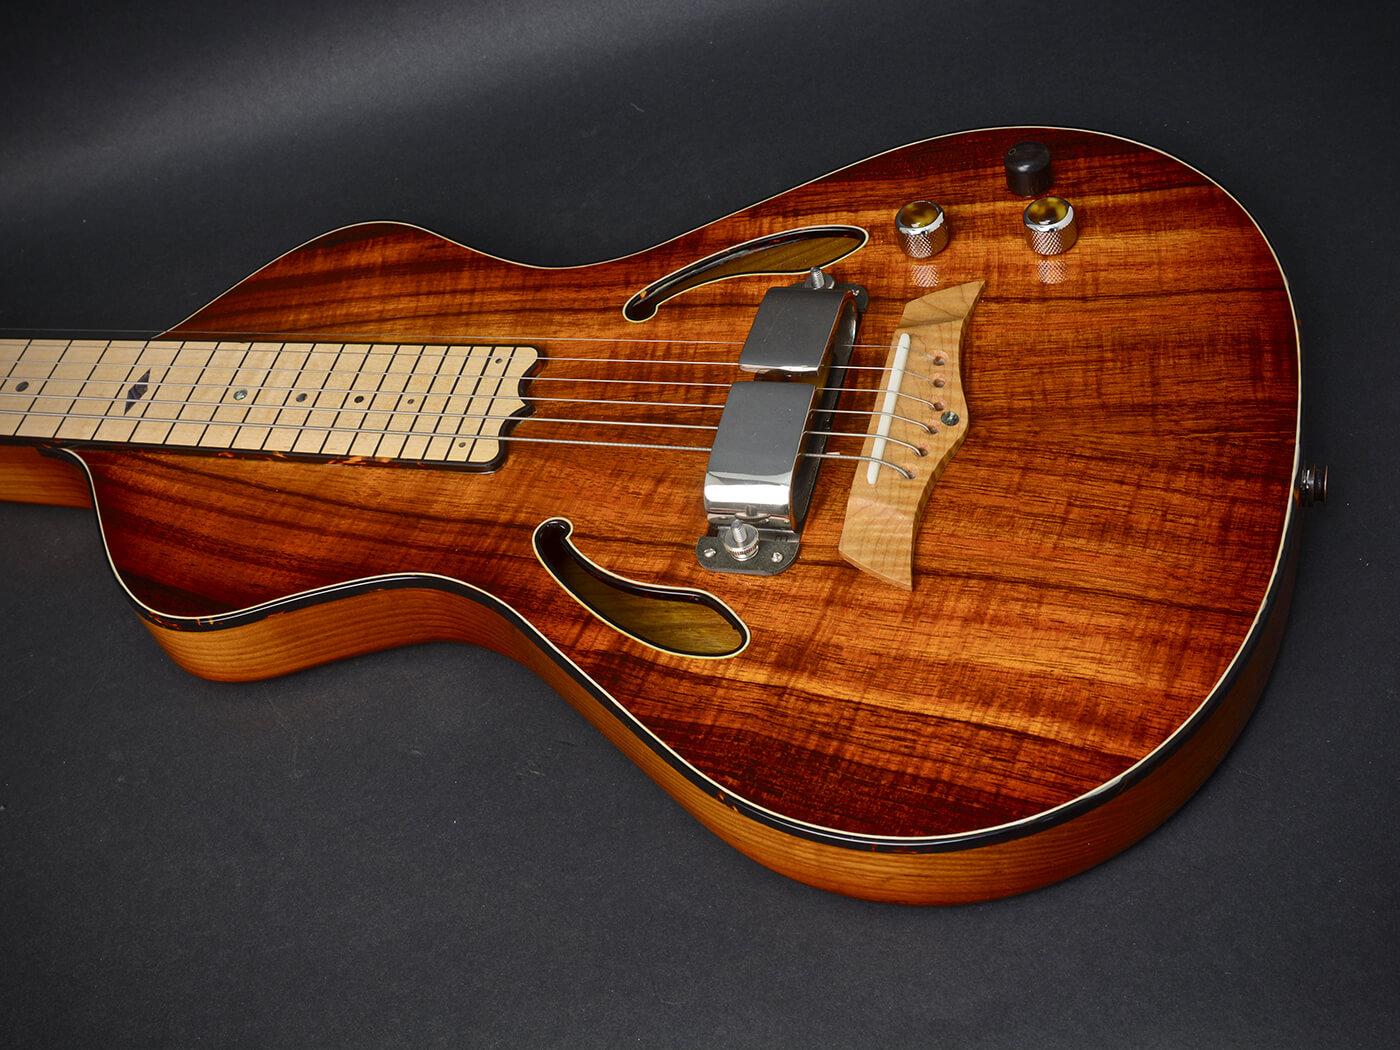 Asher Guitars